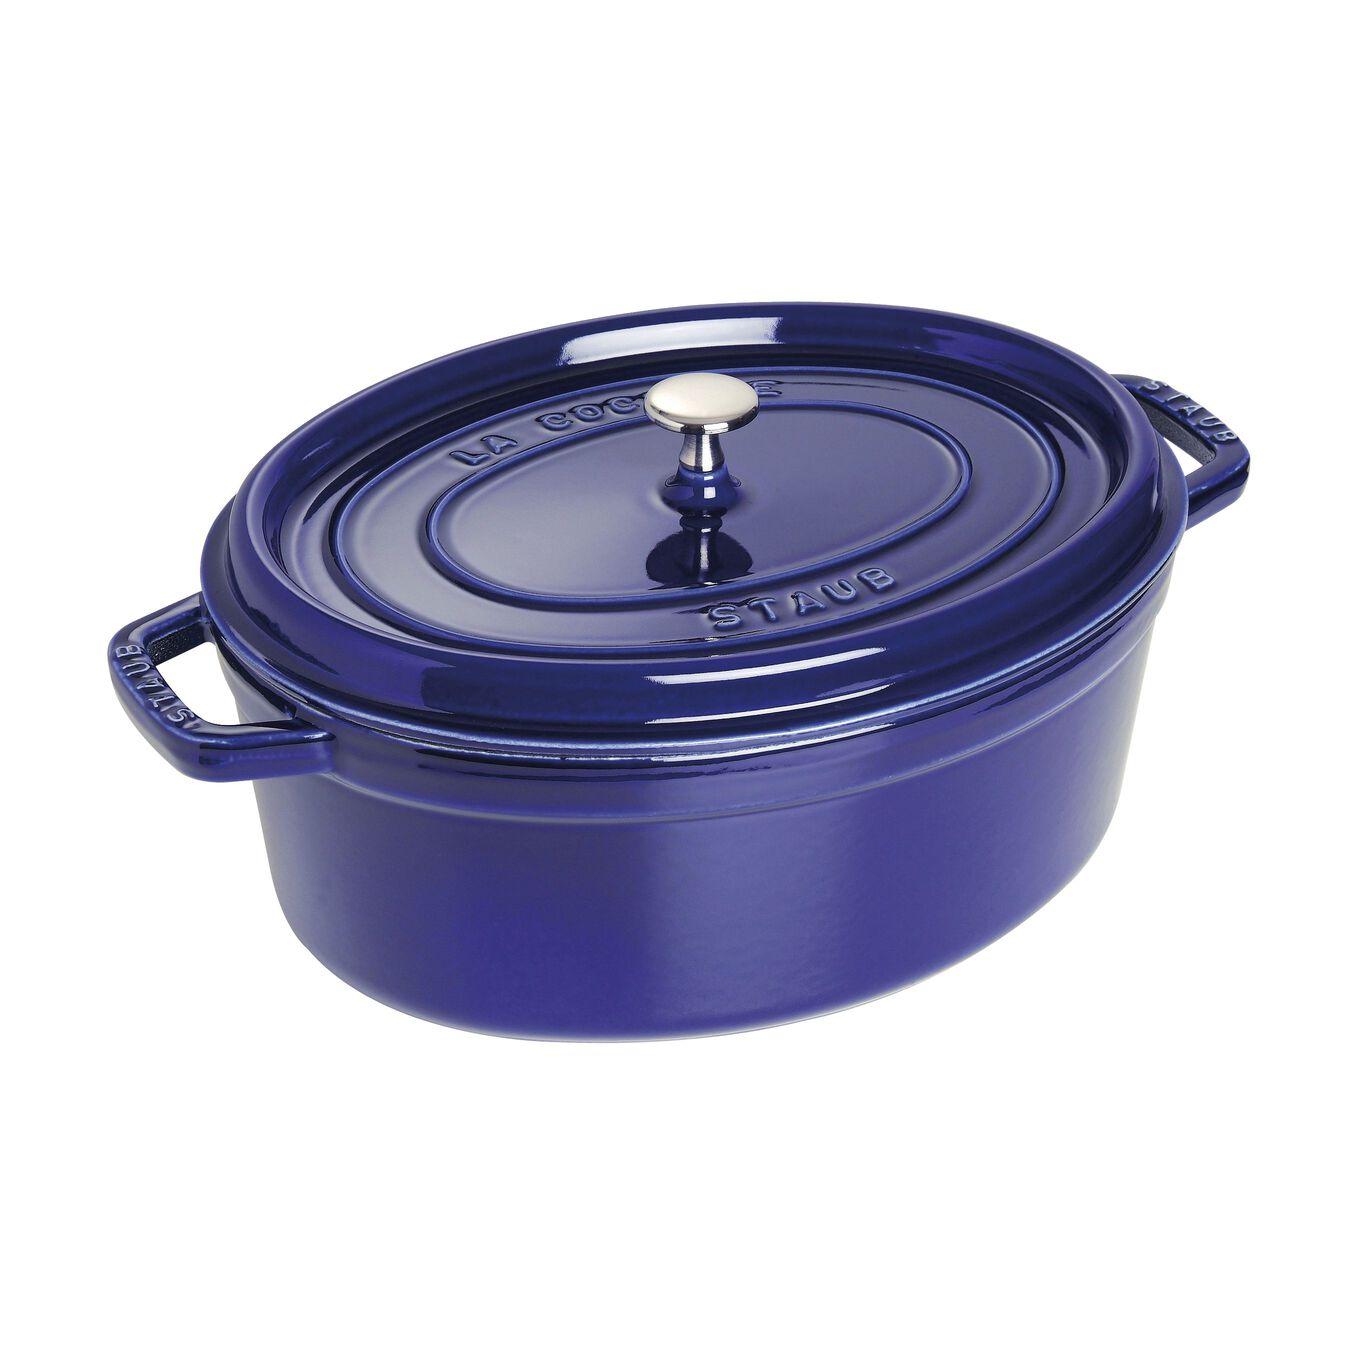 3.25 l Cast iron oval Cocotte, Dark-Blue,,large 1